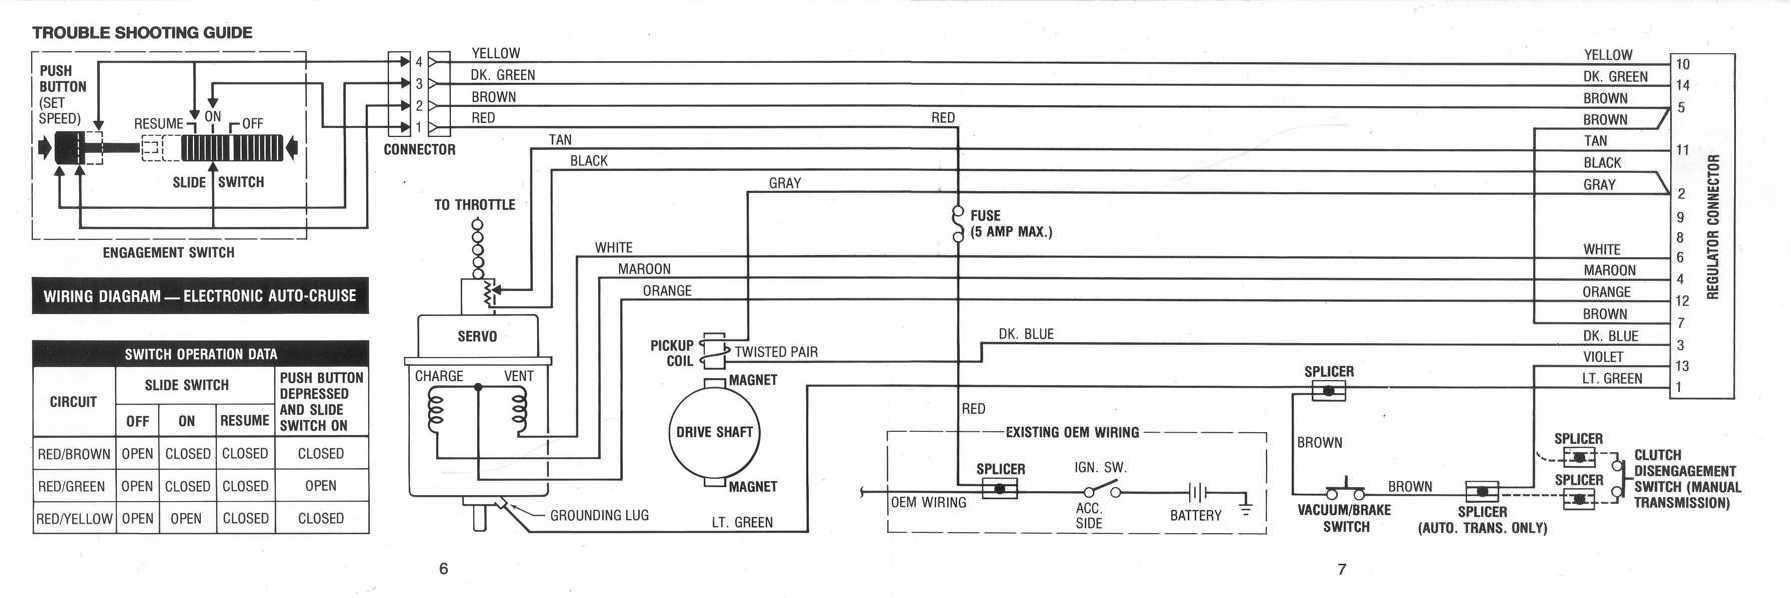 1977 04 vw t2 auto cruise wiring diagram?resize=665%2C222 zig unit wiring diagram wiring diagram zig unit wiring diagram at reclaimingppi.co